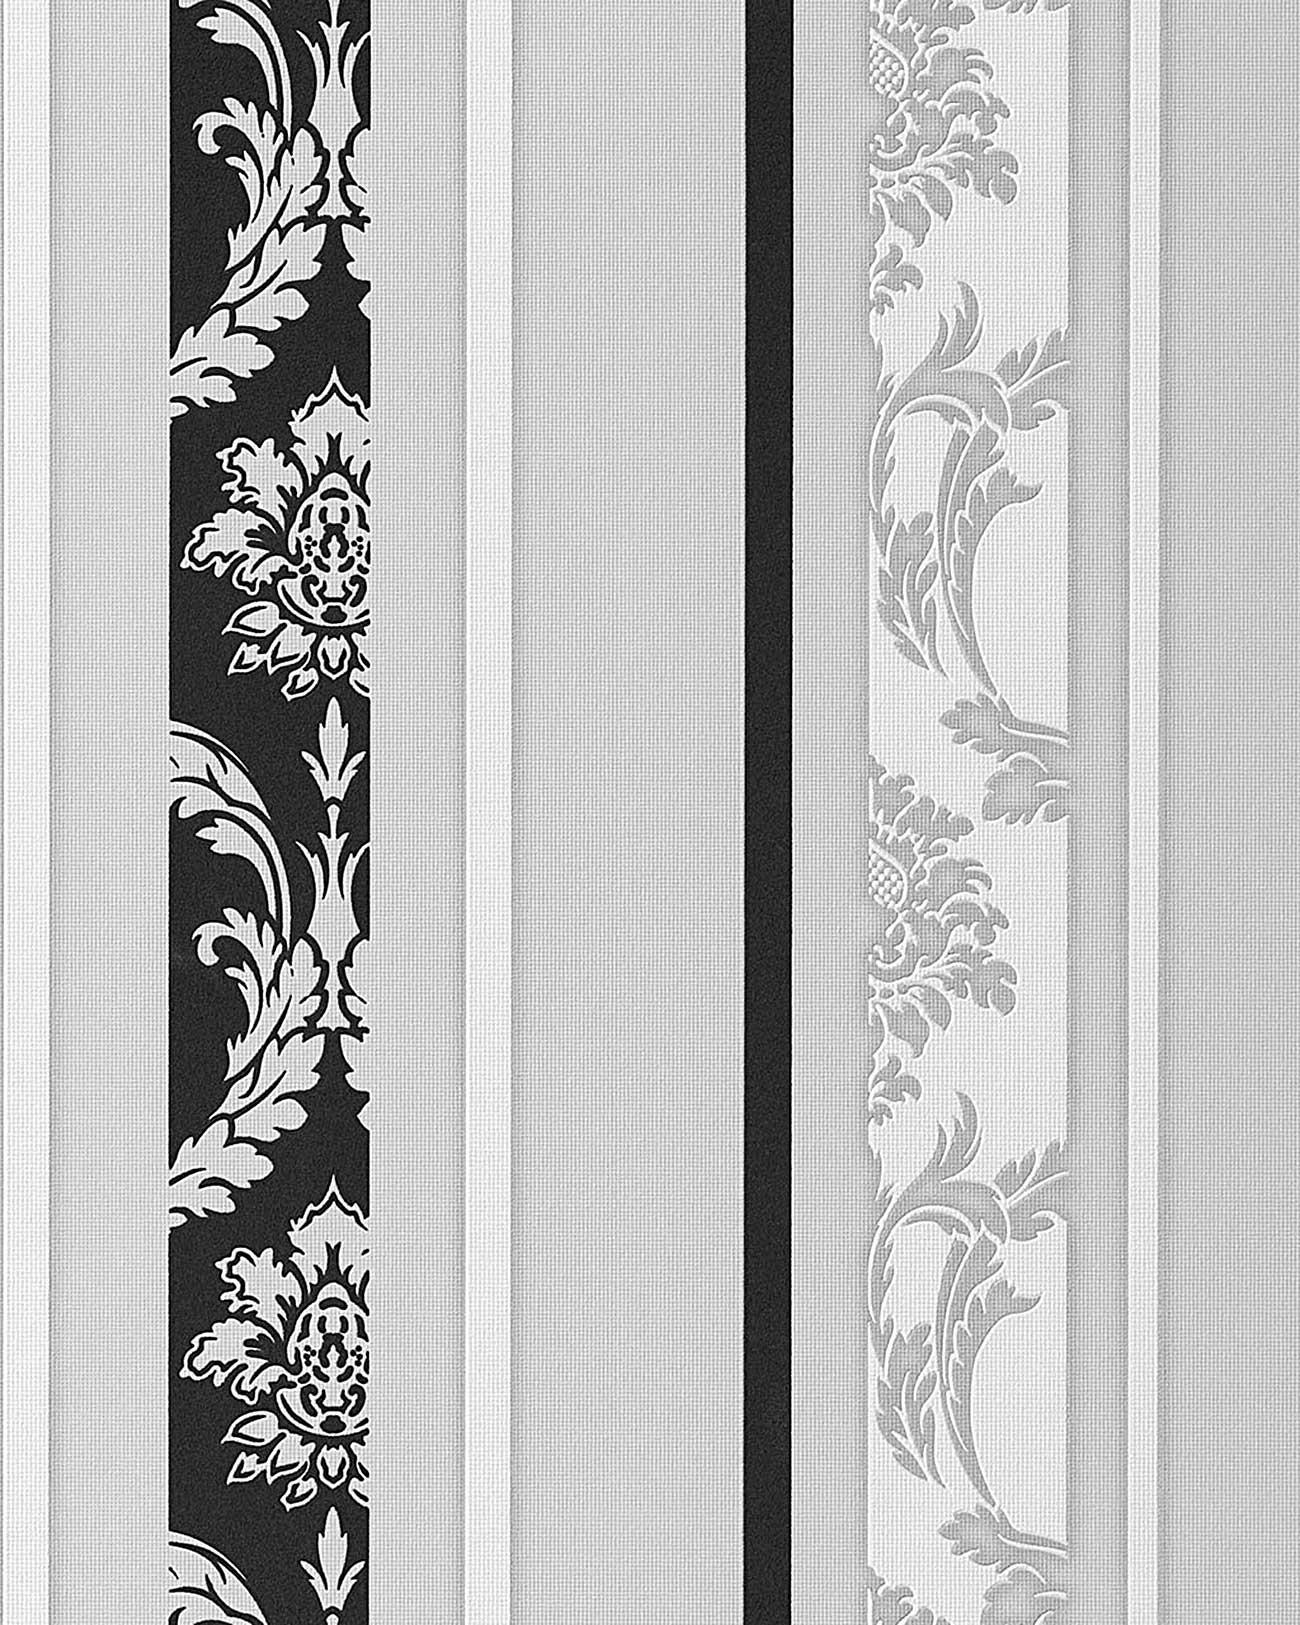 papier peint n o baroque edem 053 20 design ornement ray flockage noir blanc gris clair m2. Black Bedroom Furniture Sets. Home Design Ideas